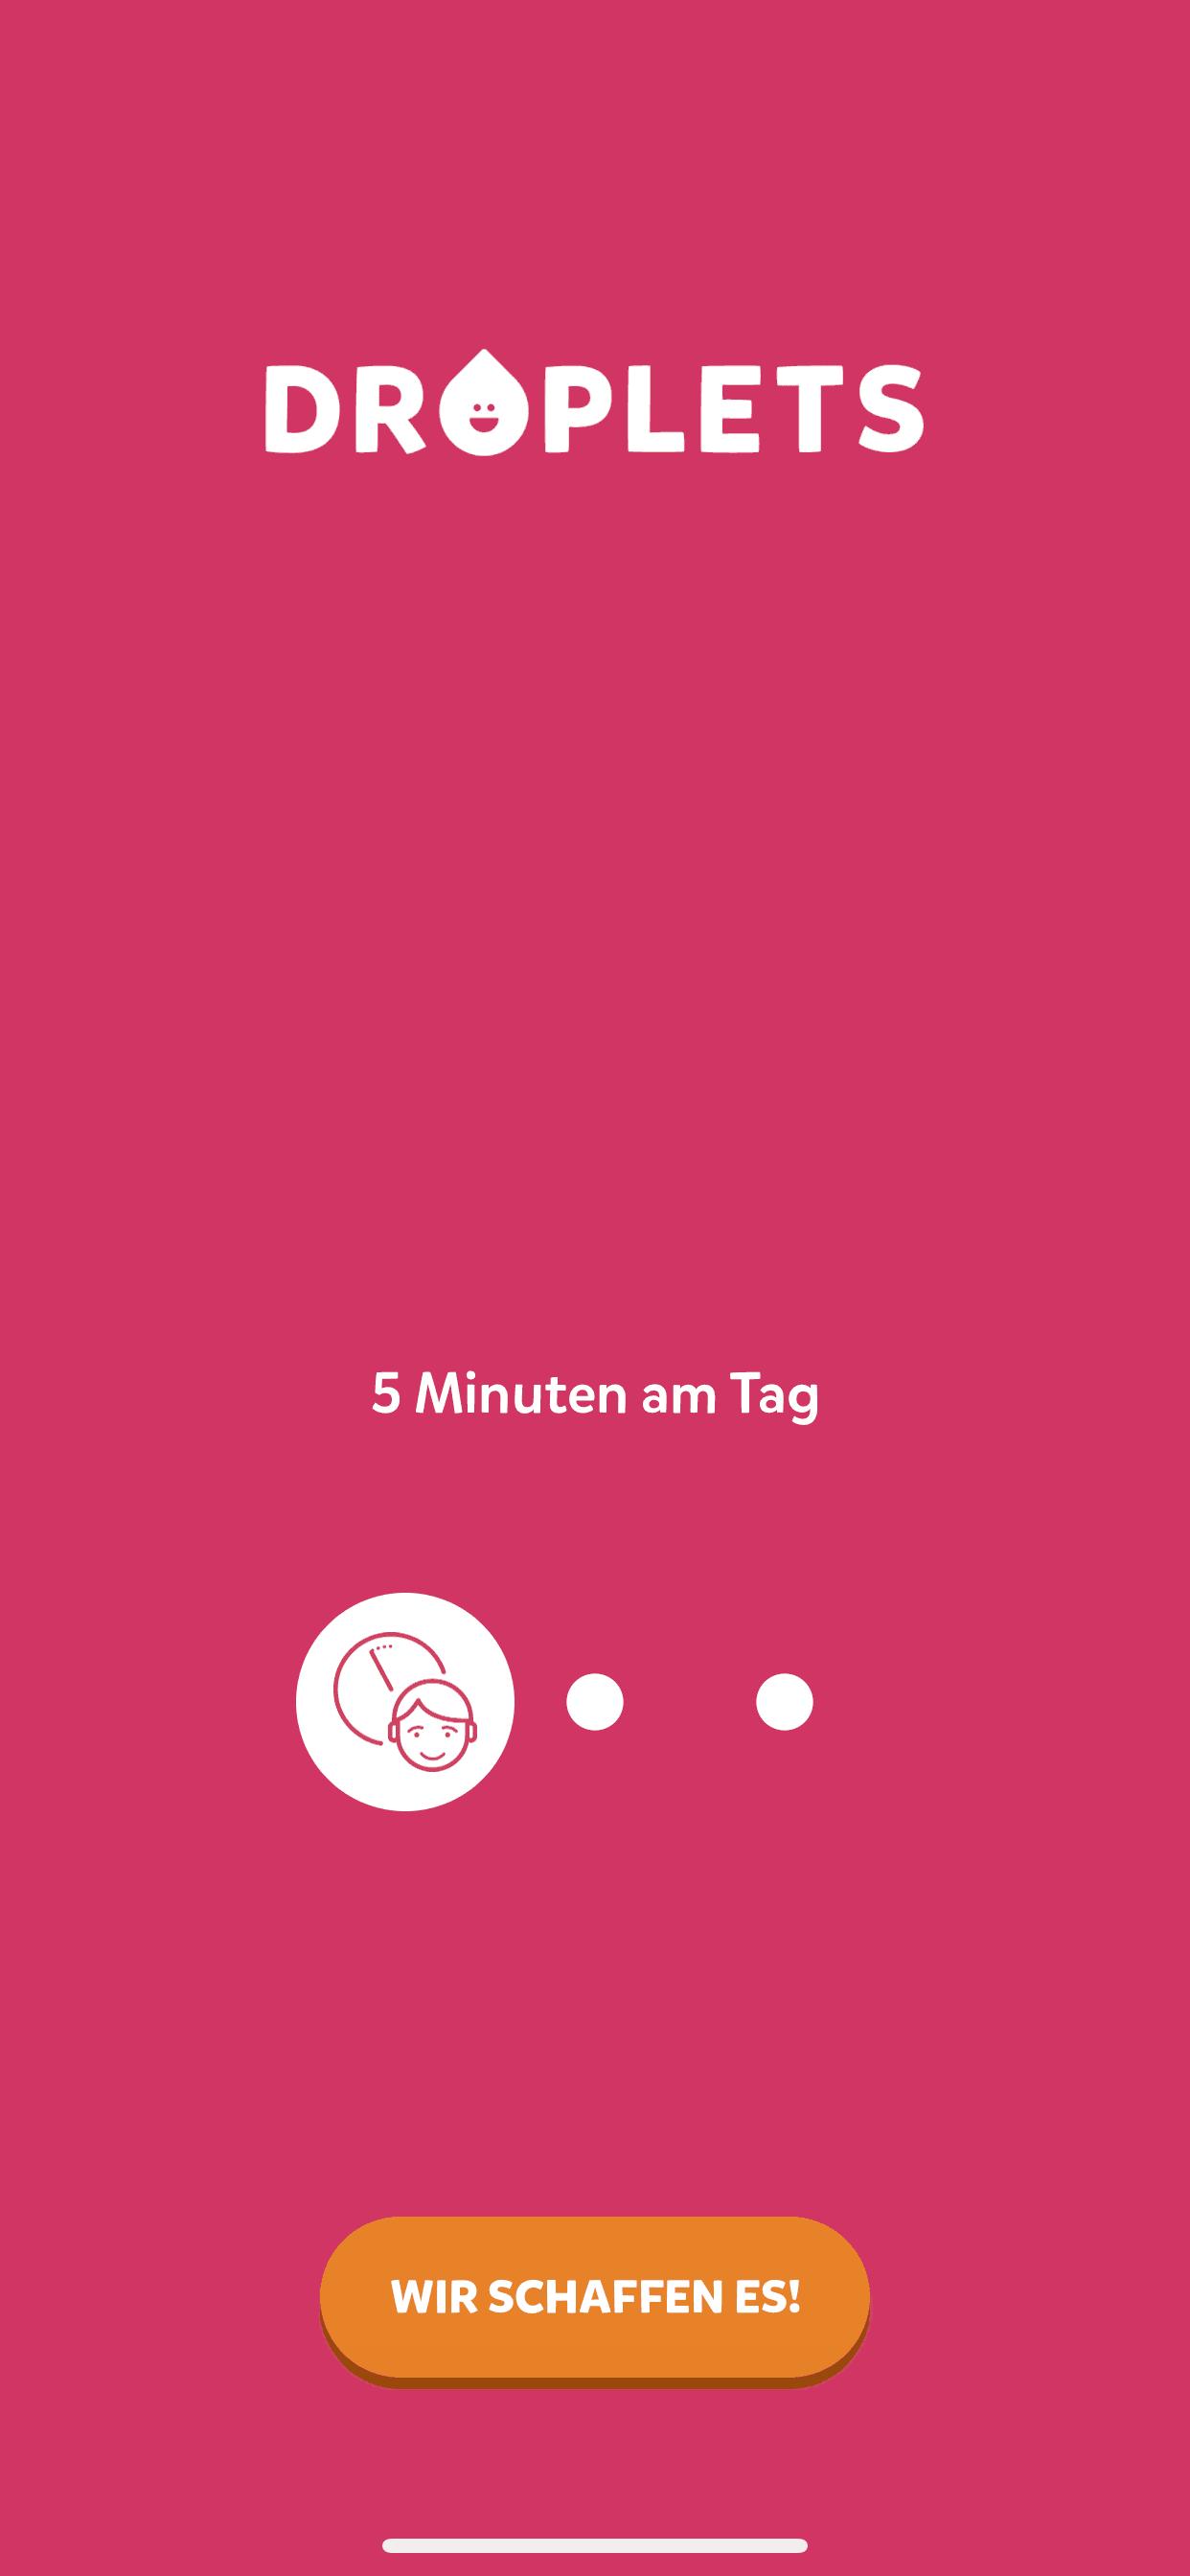 Droplets App (iOS): Sprachen lernen für Kinder 2 techboys.de • smarte News, auf den Punkt! Droplets App (iOS): Sprachen lernen für Kinder